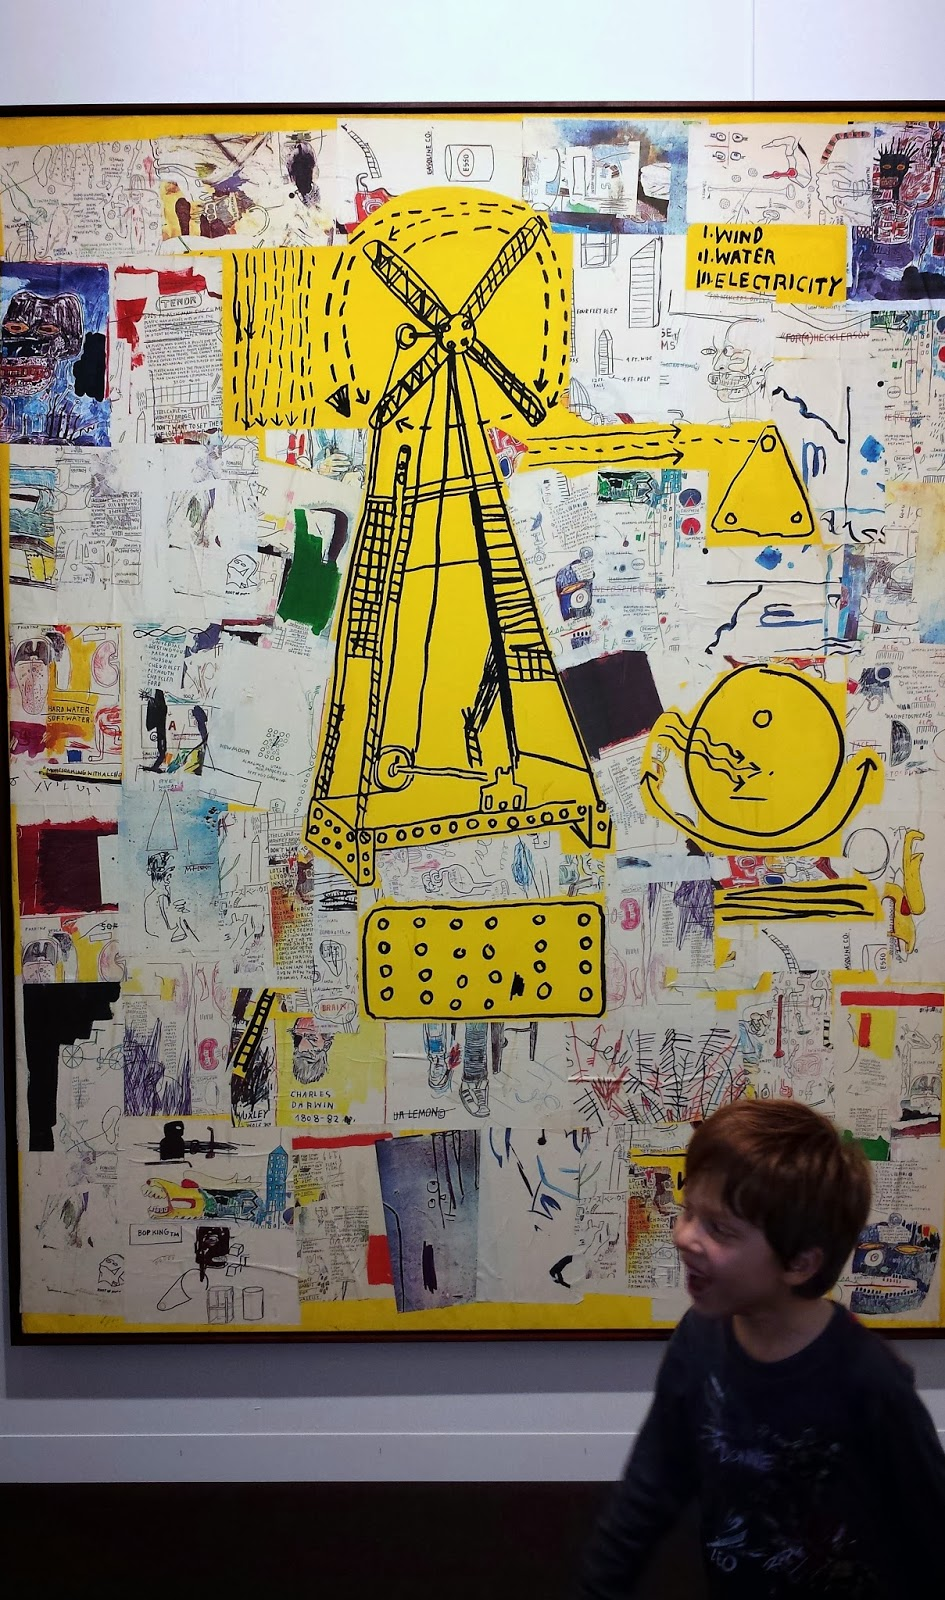 DAVID MATTHEW WRIGHT BLOG: Art Basel Miami Beach 2013